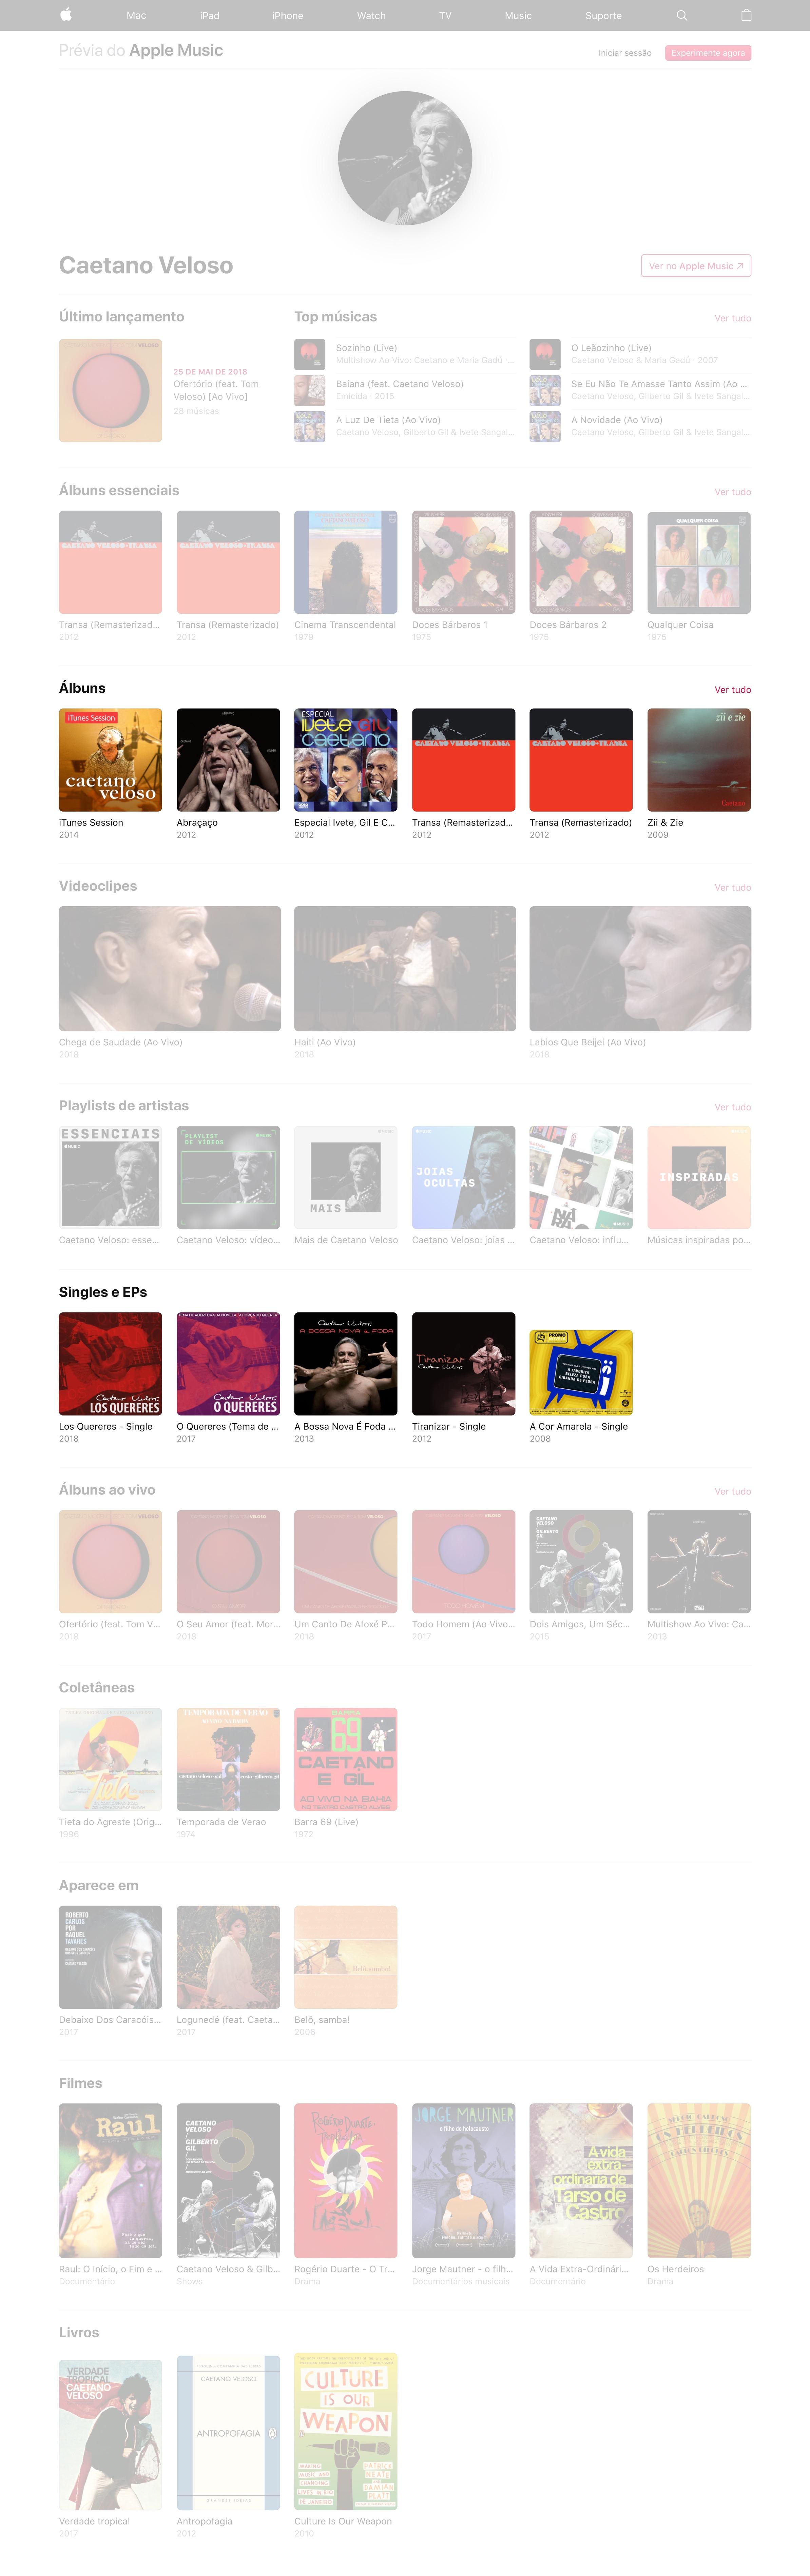 Página de Caetano Veloso no Apple Music